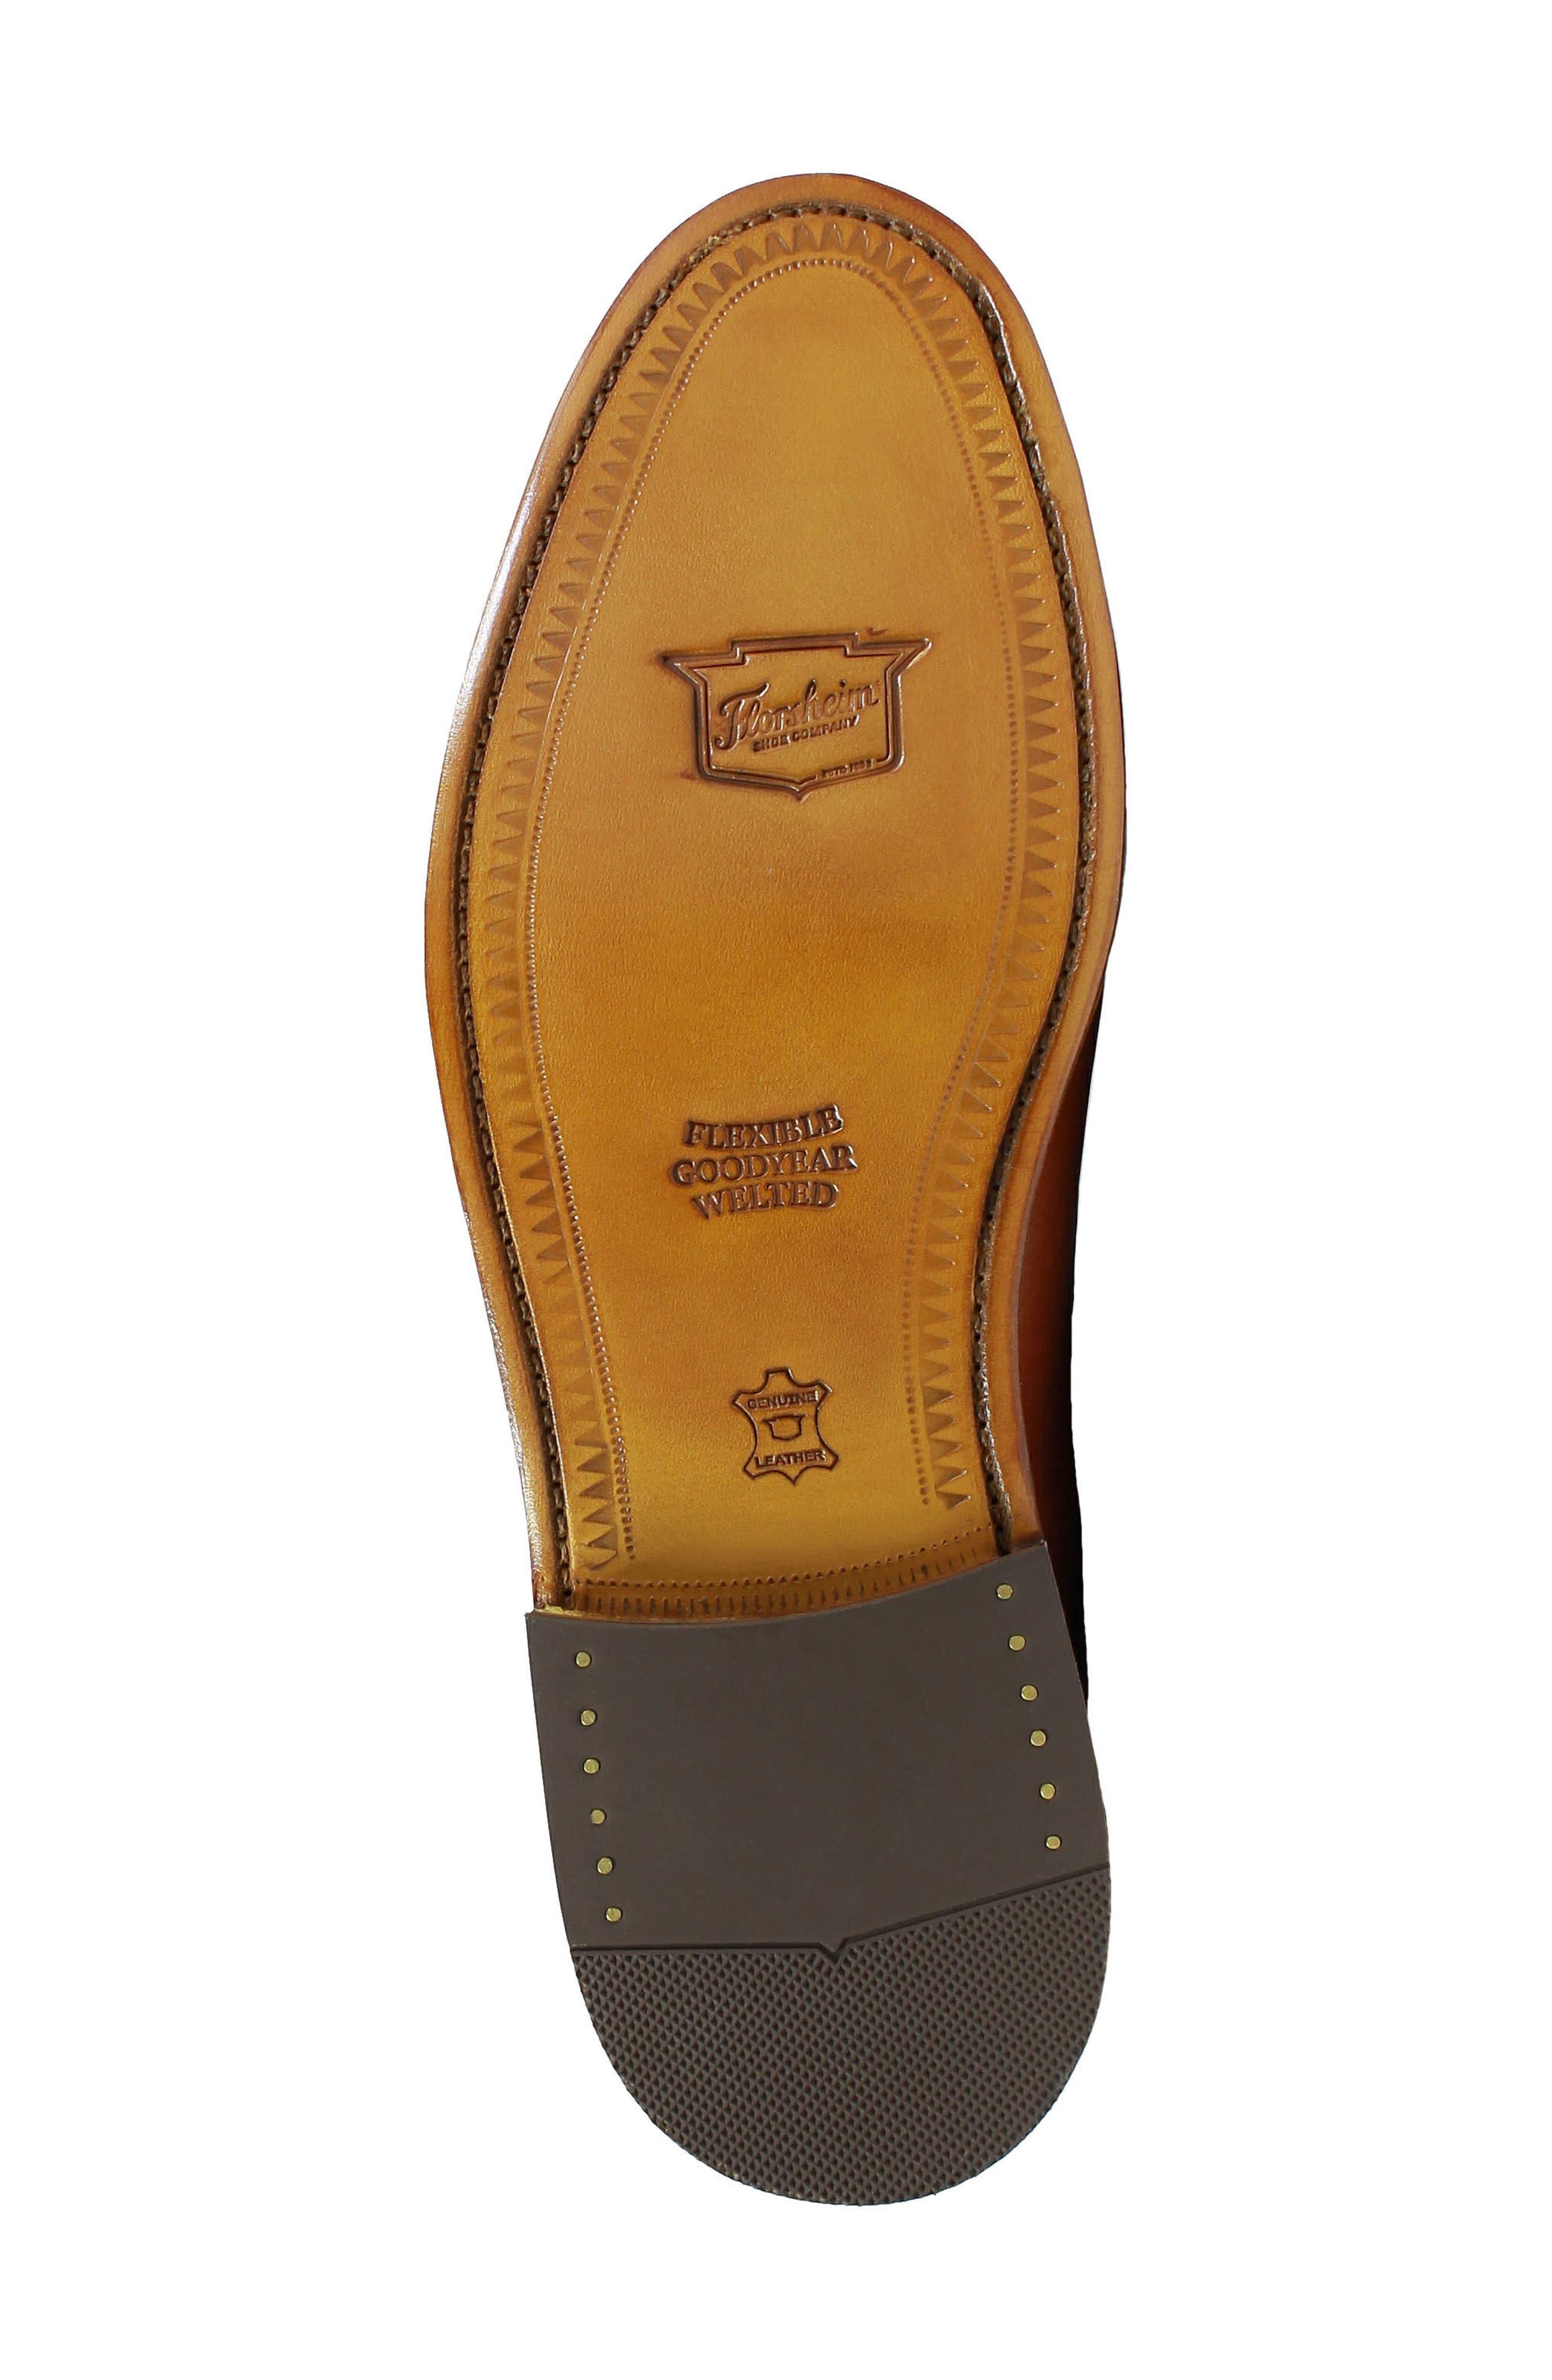 'Heritage' Wingtip,                             Alternate thumbnail 6, color,                             Cognac Leather/ Mesh